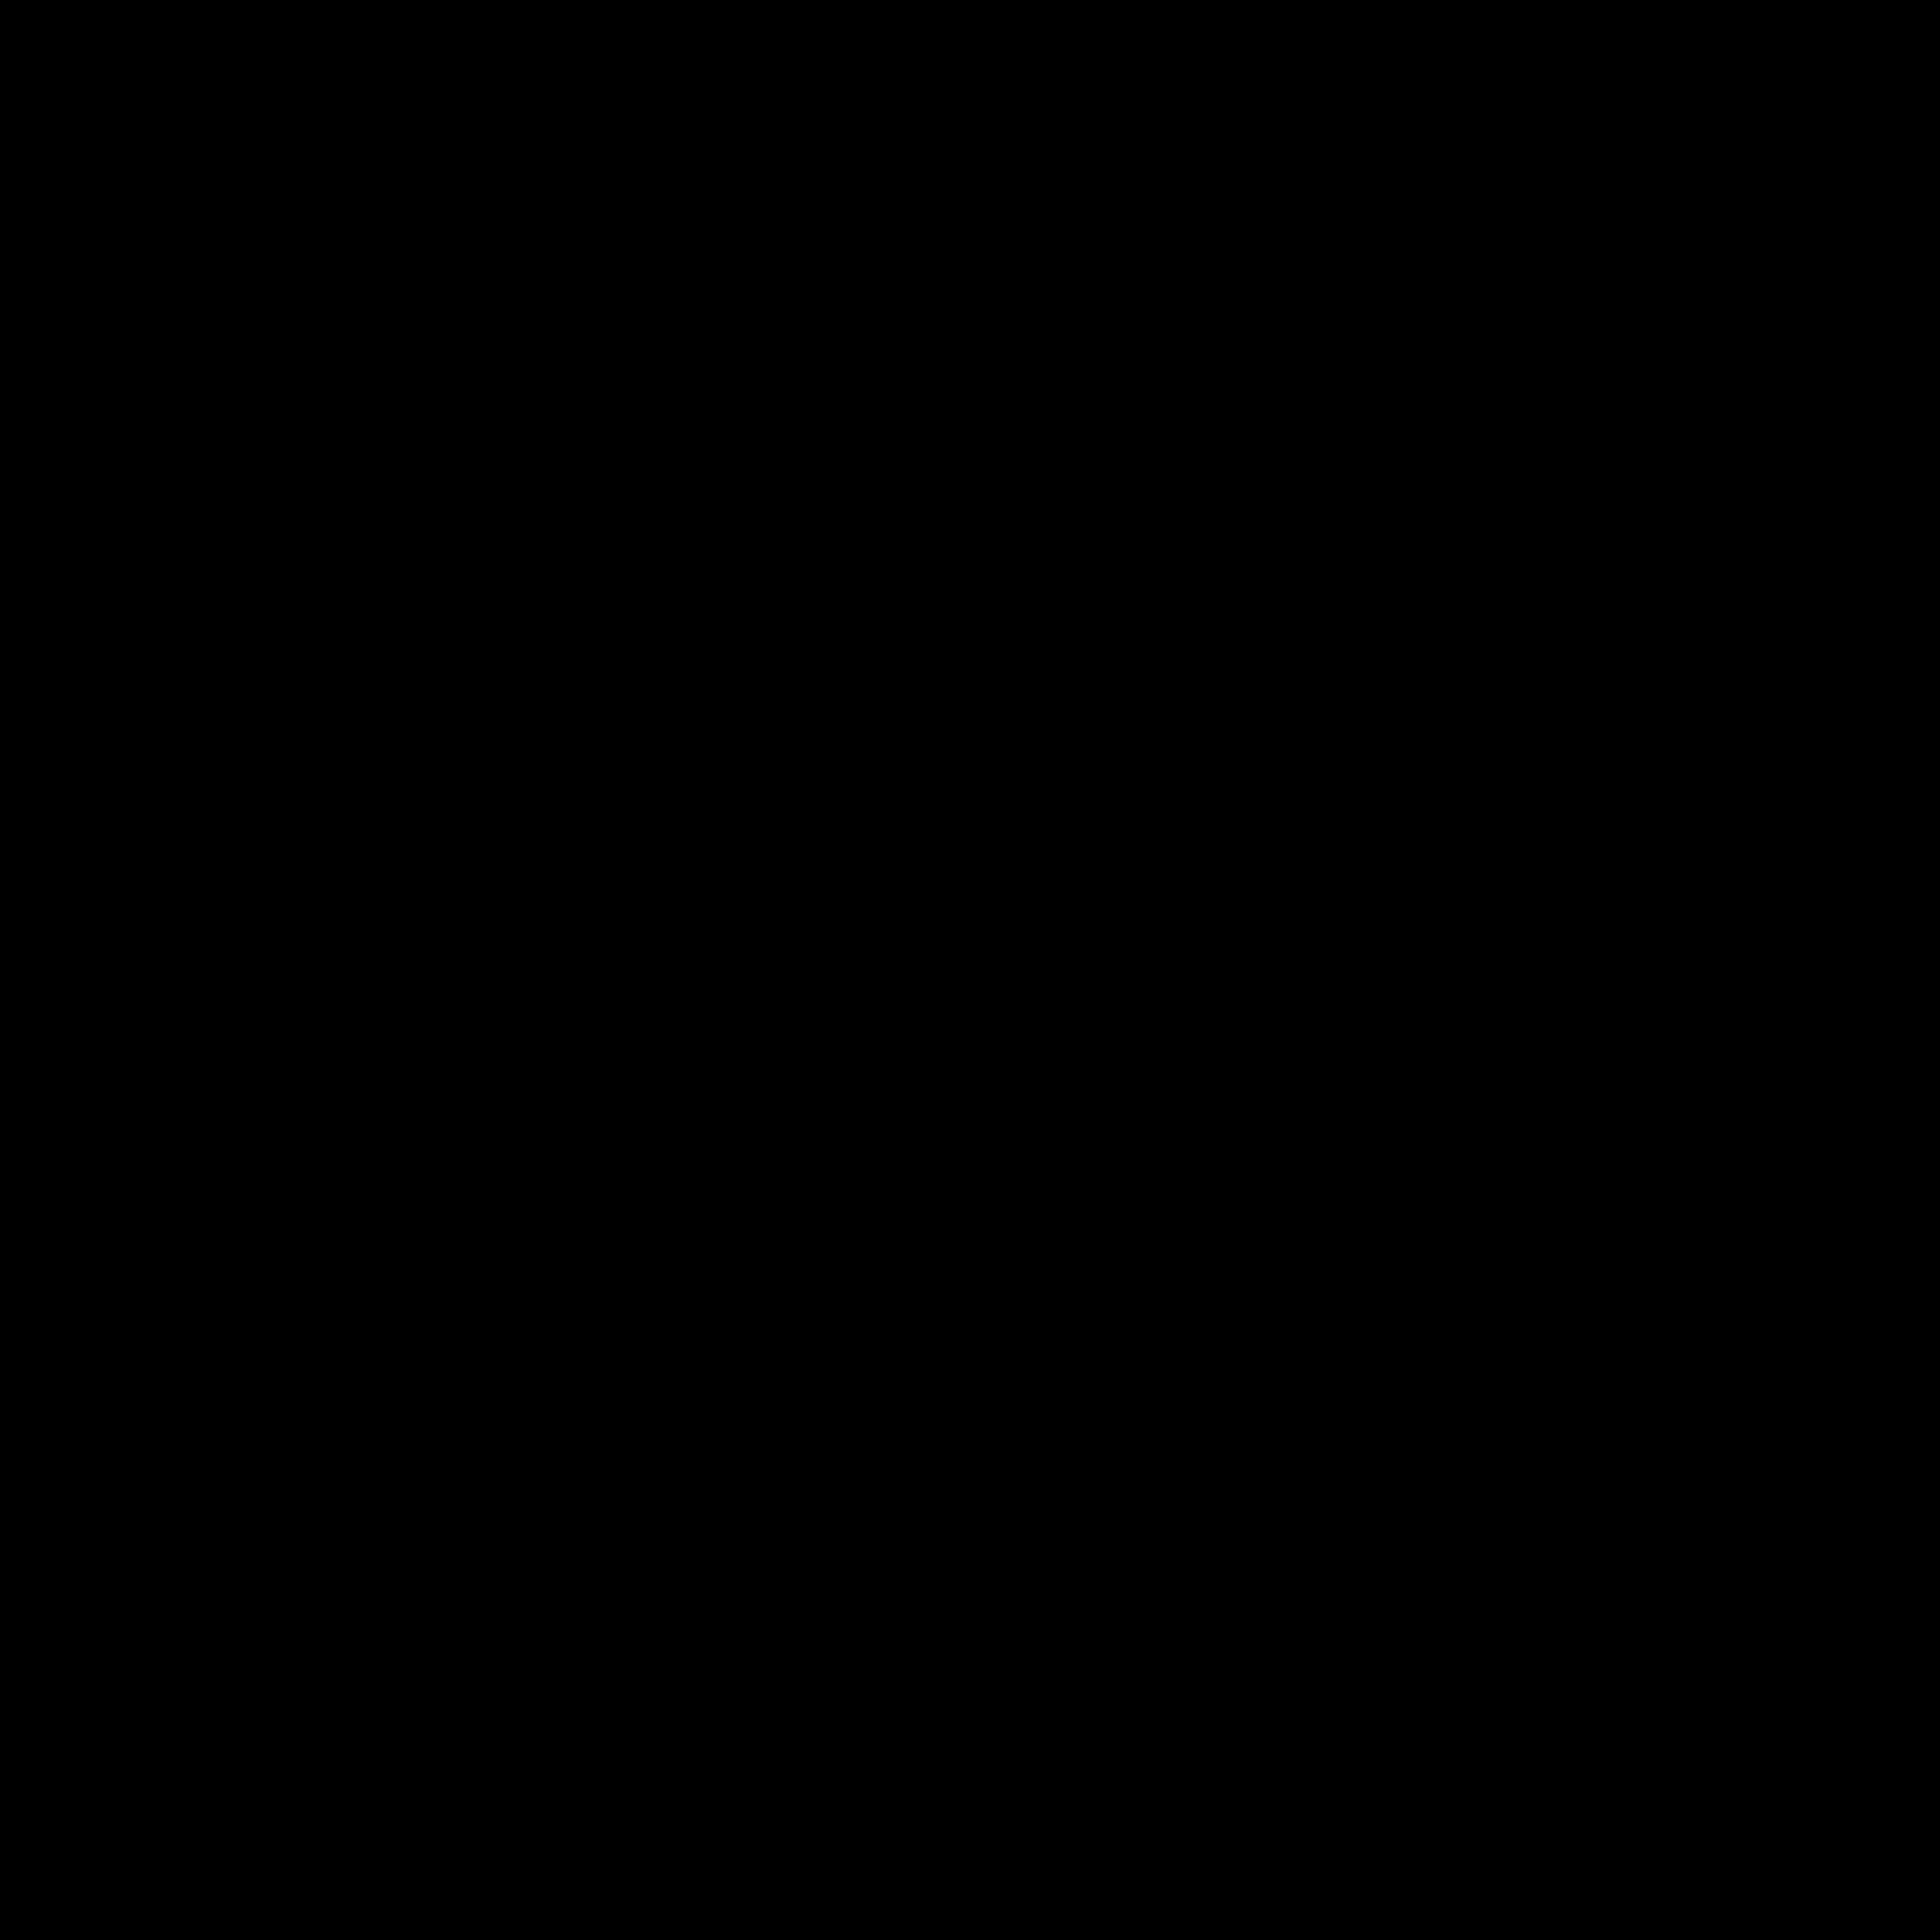 Pentel Hi-Polymer Block Eraser, Small Black 48 pack (ZEAH06A) by Pentel (Image #2)